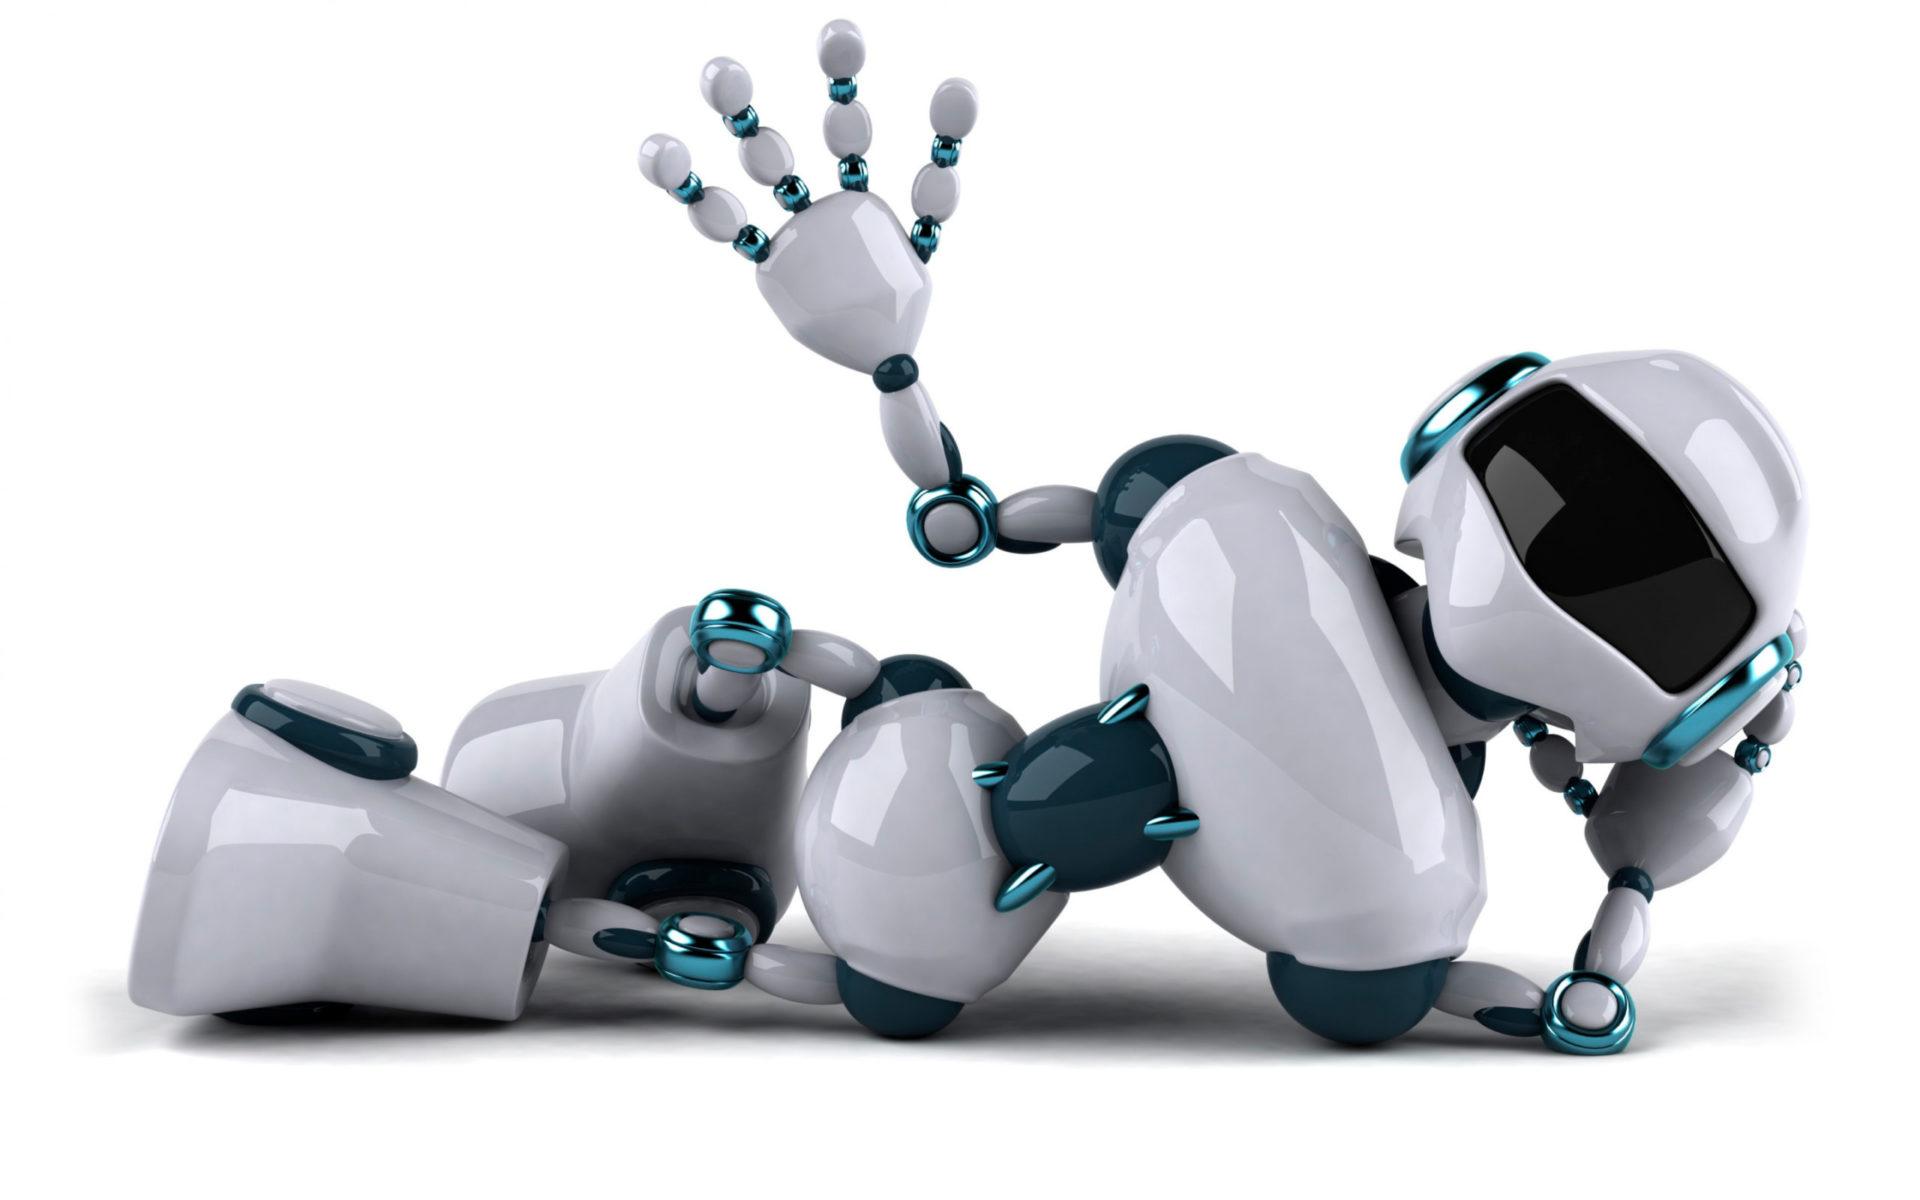 kisspng-robot-tax-social-robot-machine-artificial-intellig-hello-robot-5a9f33426cc1e7.2769124615203827864455